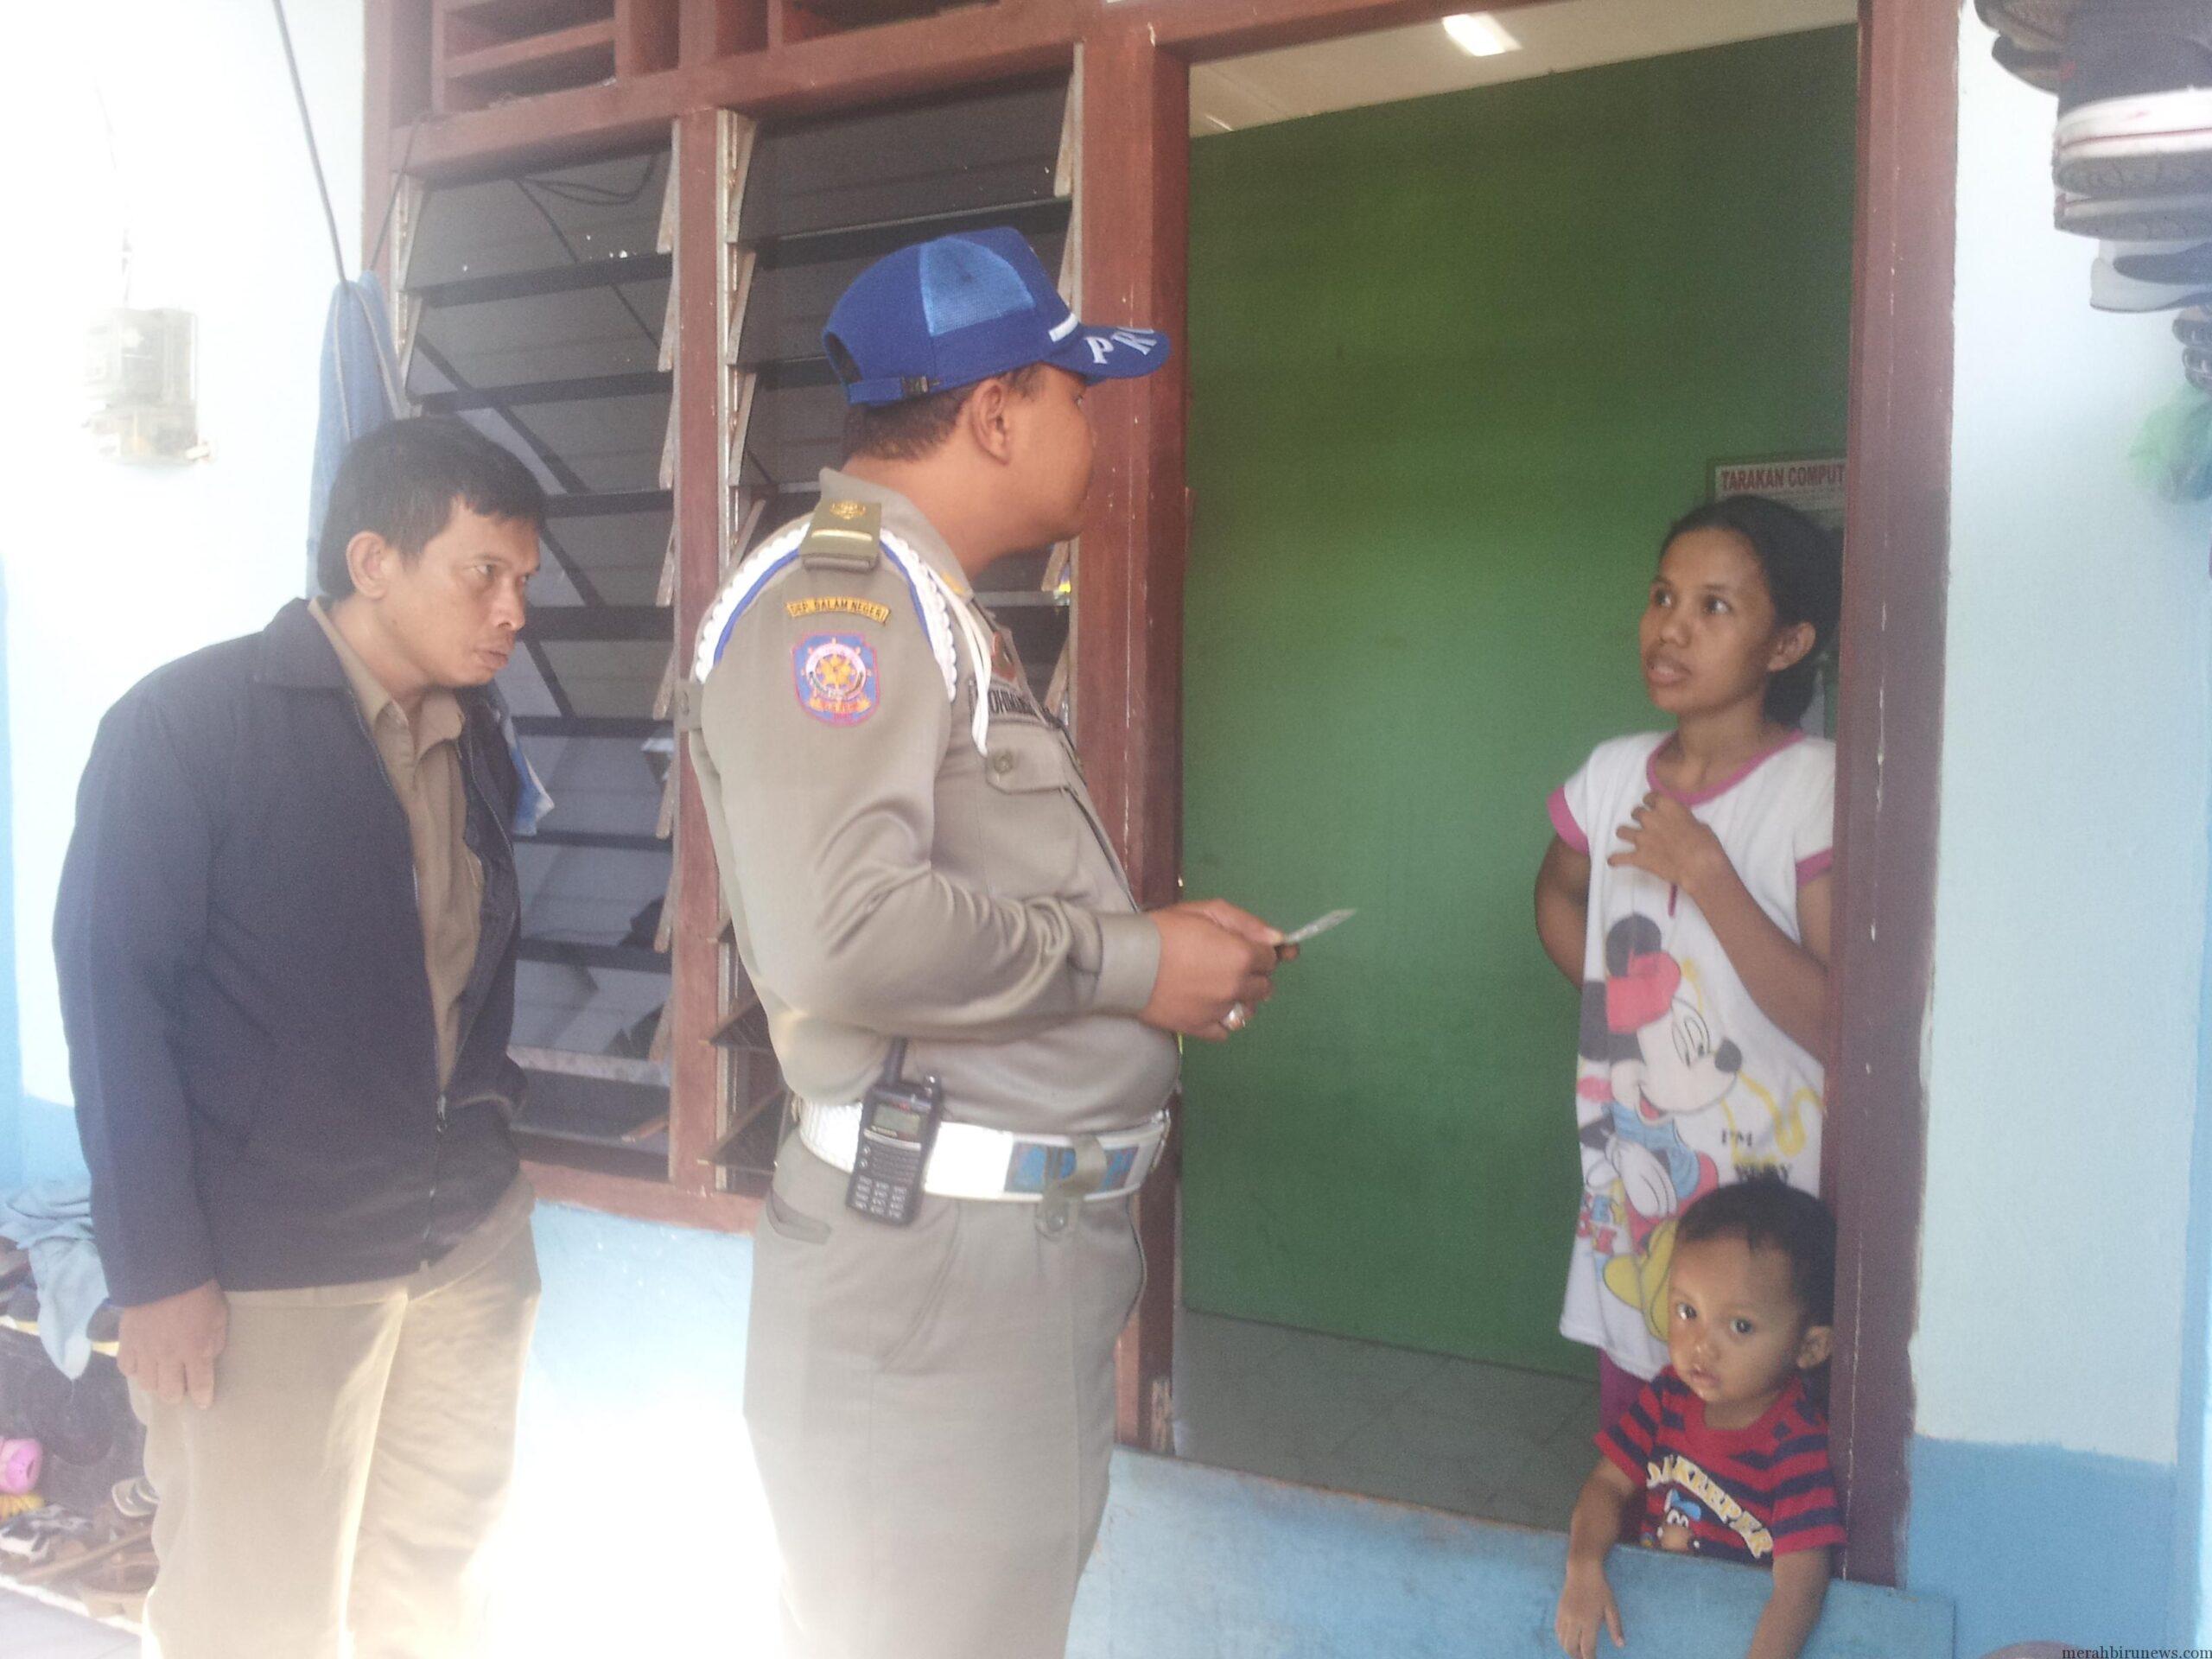 Disdukcapil bersama Satpol PP dan Instansi Terkait Gelar Razia KTP di Wilayah Kampung 6 Tarakan (CTR)